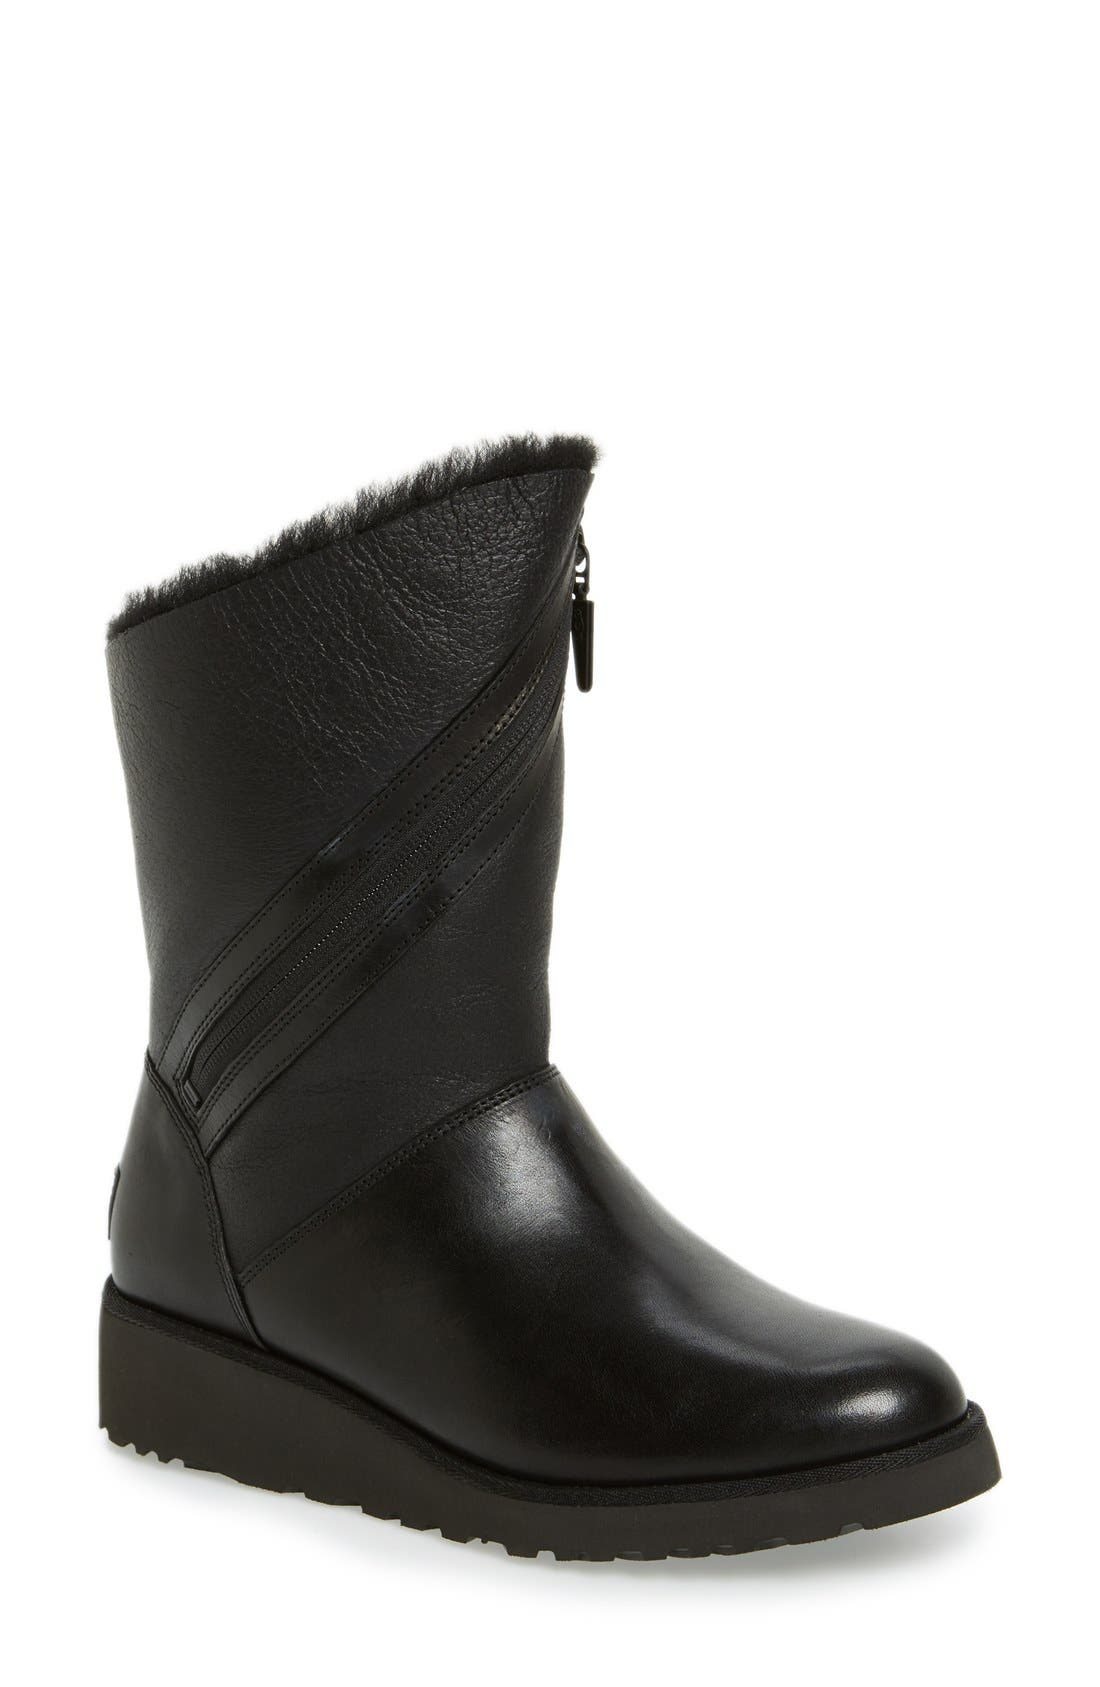 'Lorna' Wedge Boot, Main, color, 001